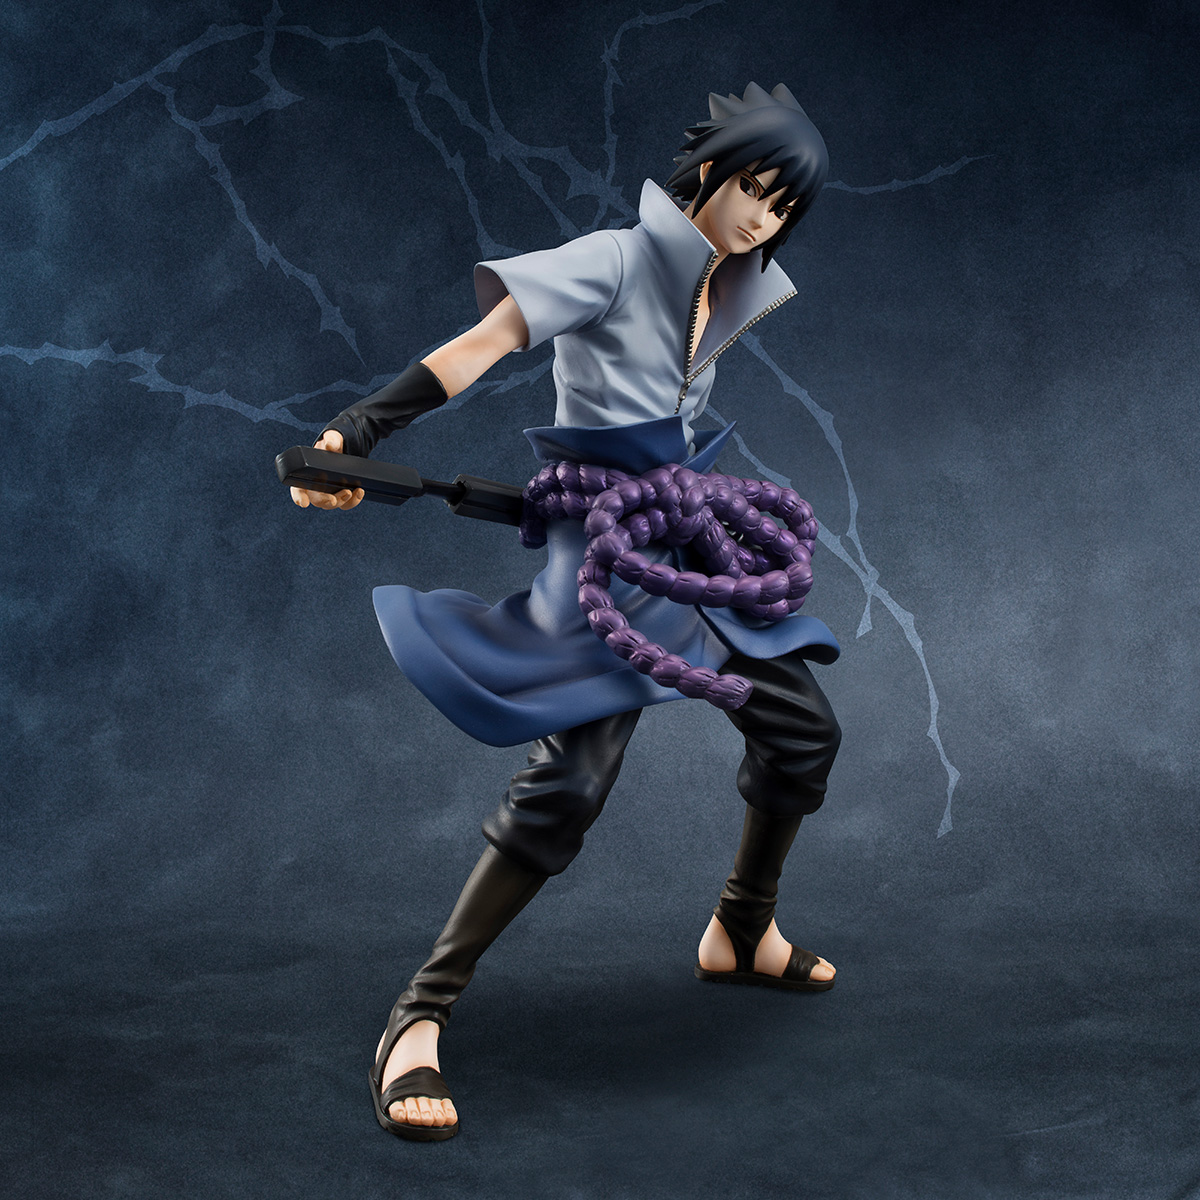 Sasuke Uchiha (Re-run) Naruto Shippuden GEM Series Figure